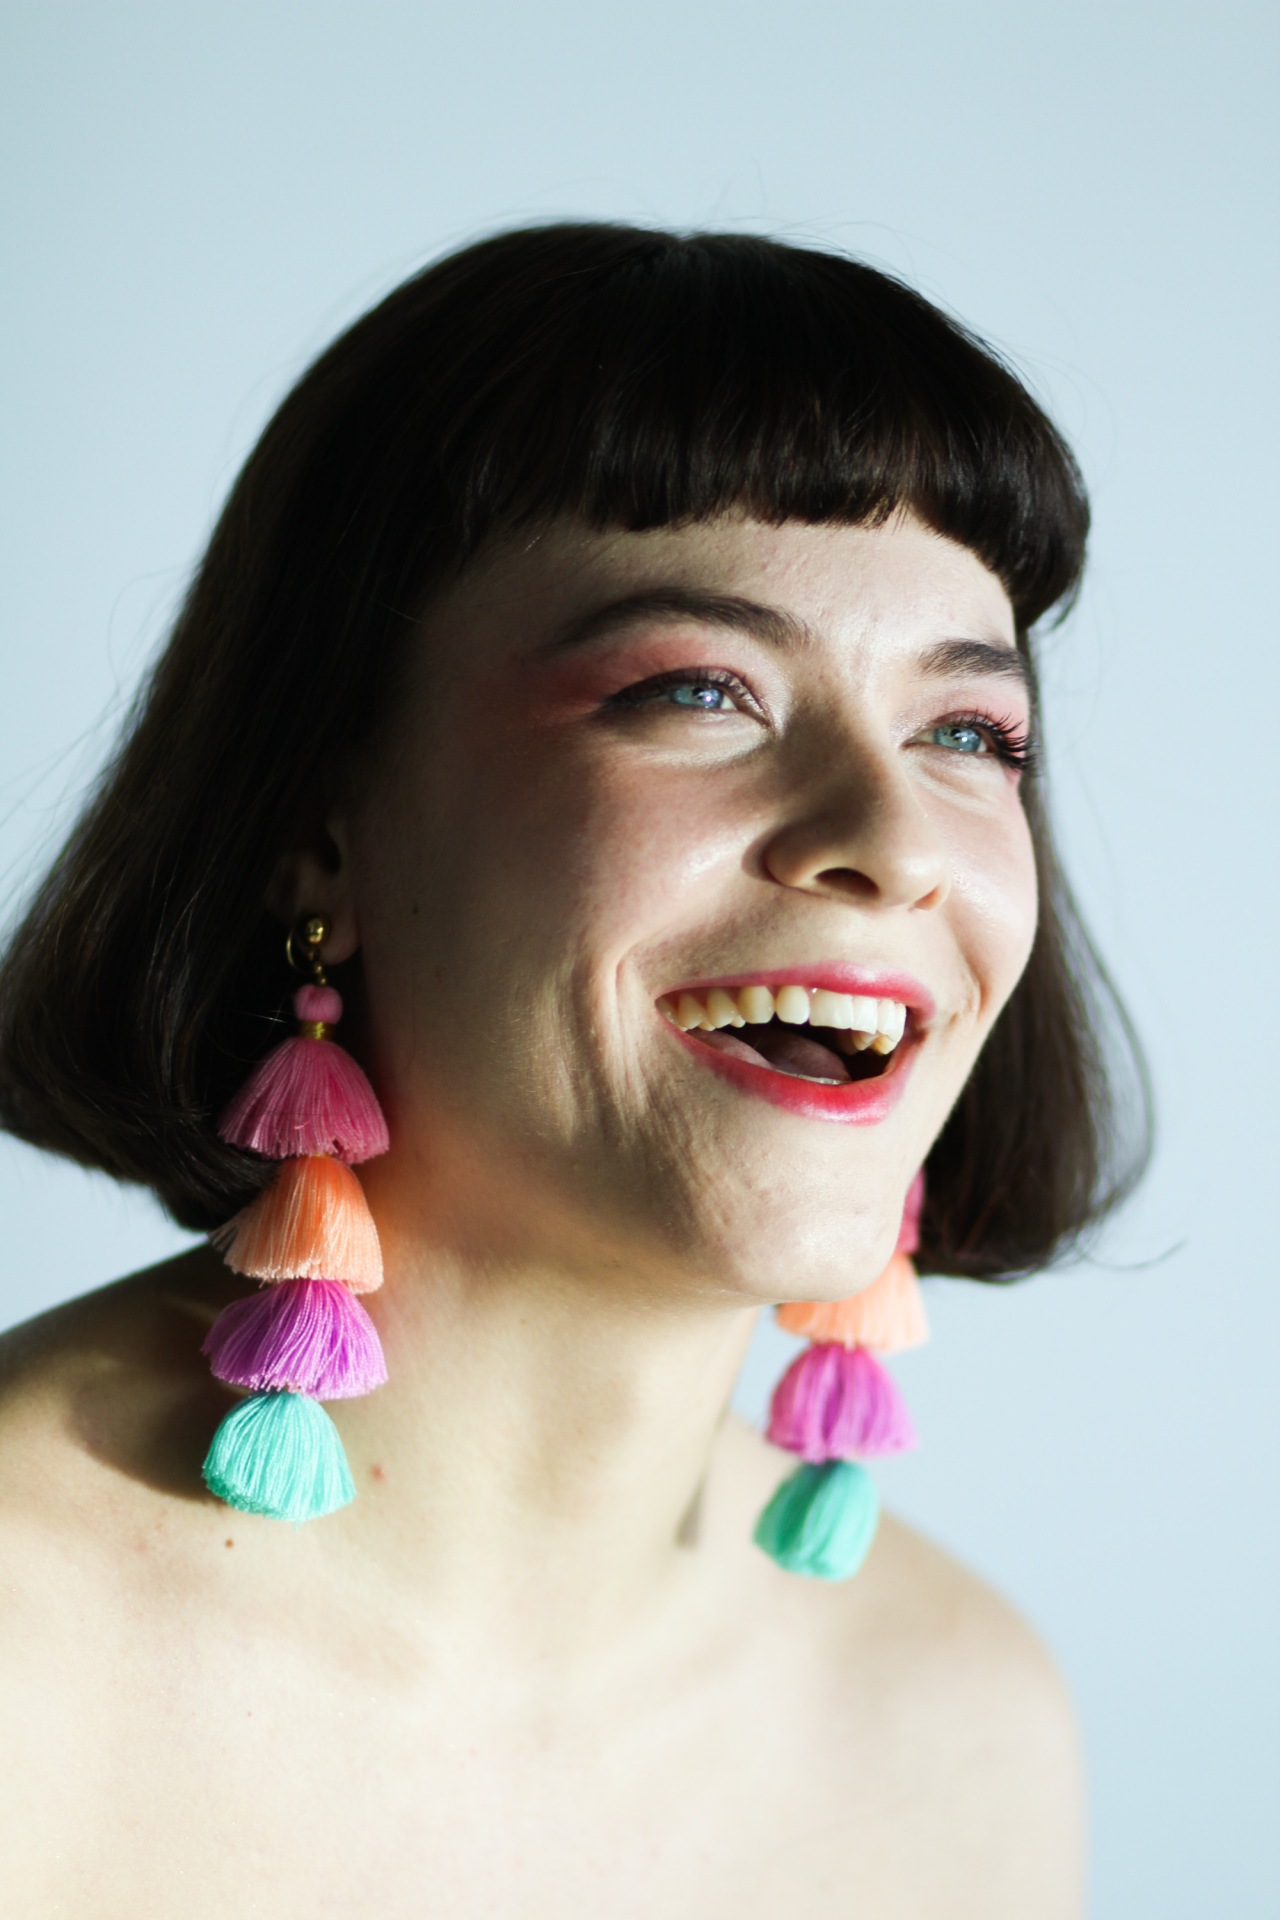 myrainbowtee earrings photo marie my-17